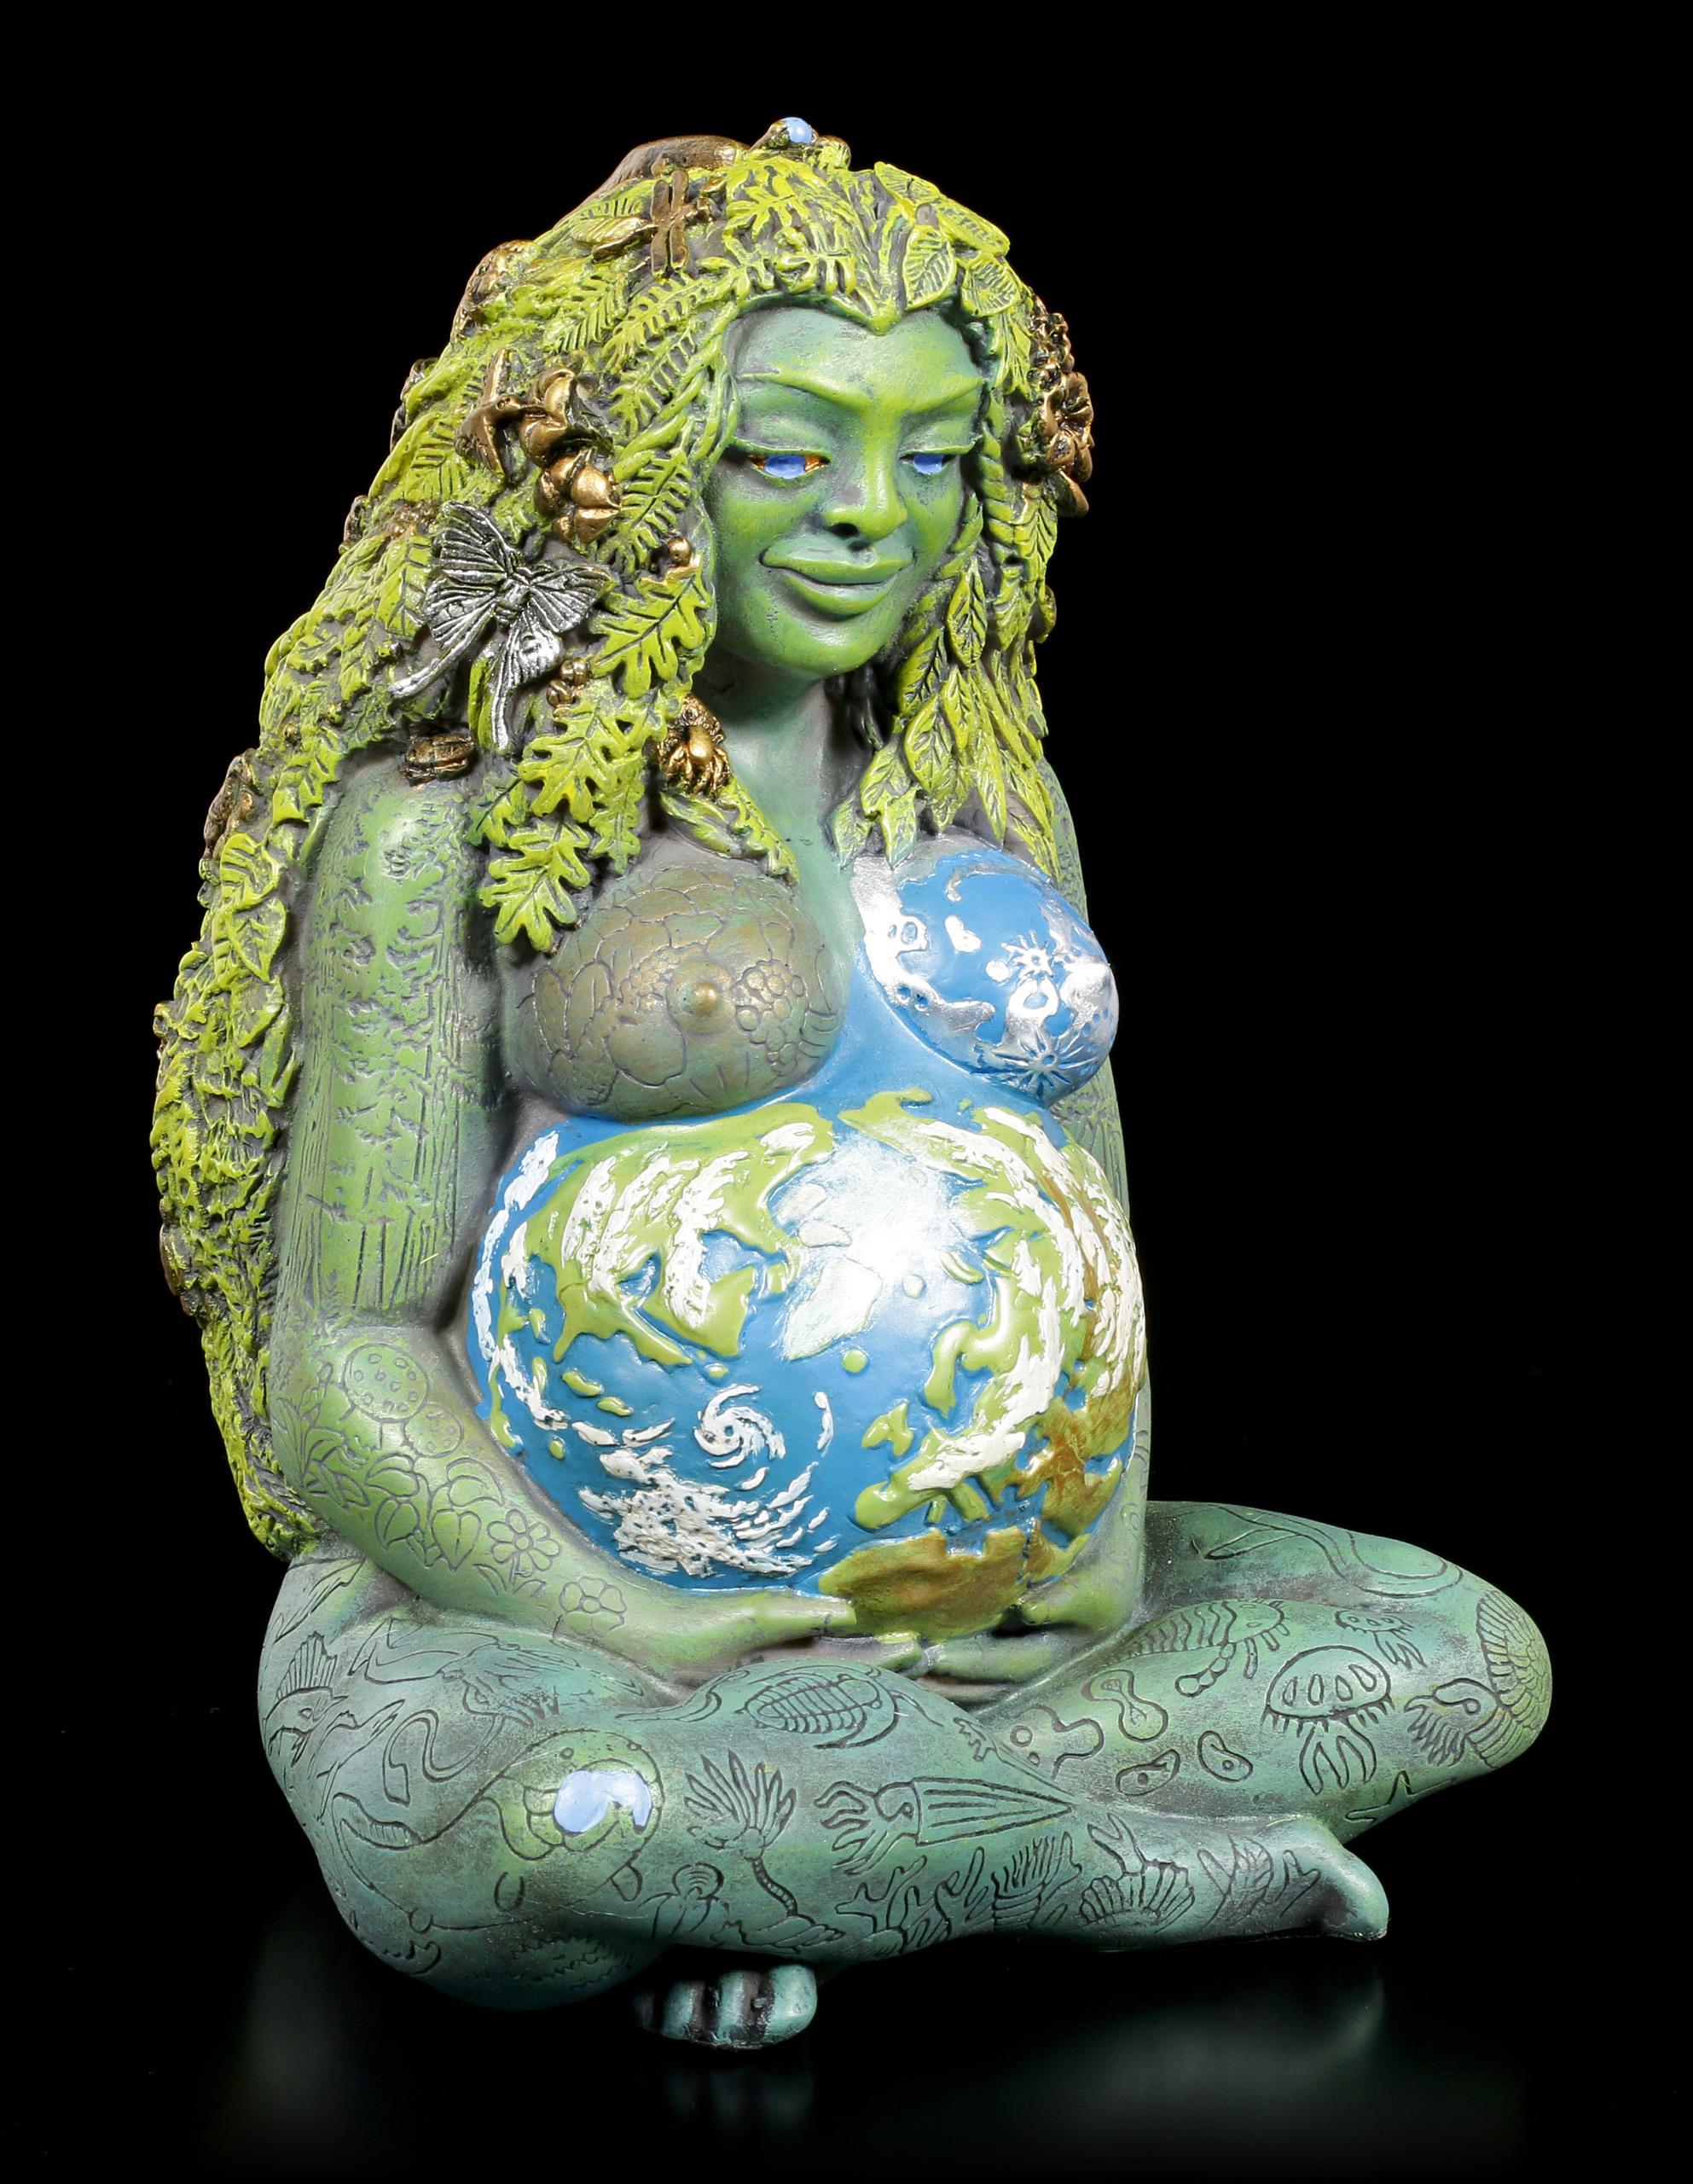 Ancient Gaia Statue millennial gaia figurine - mother earth